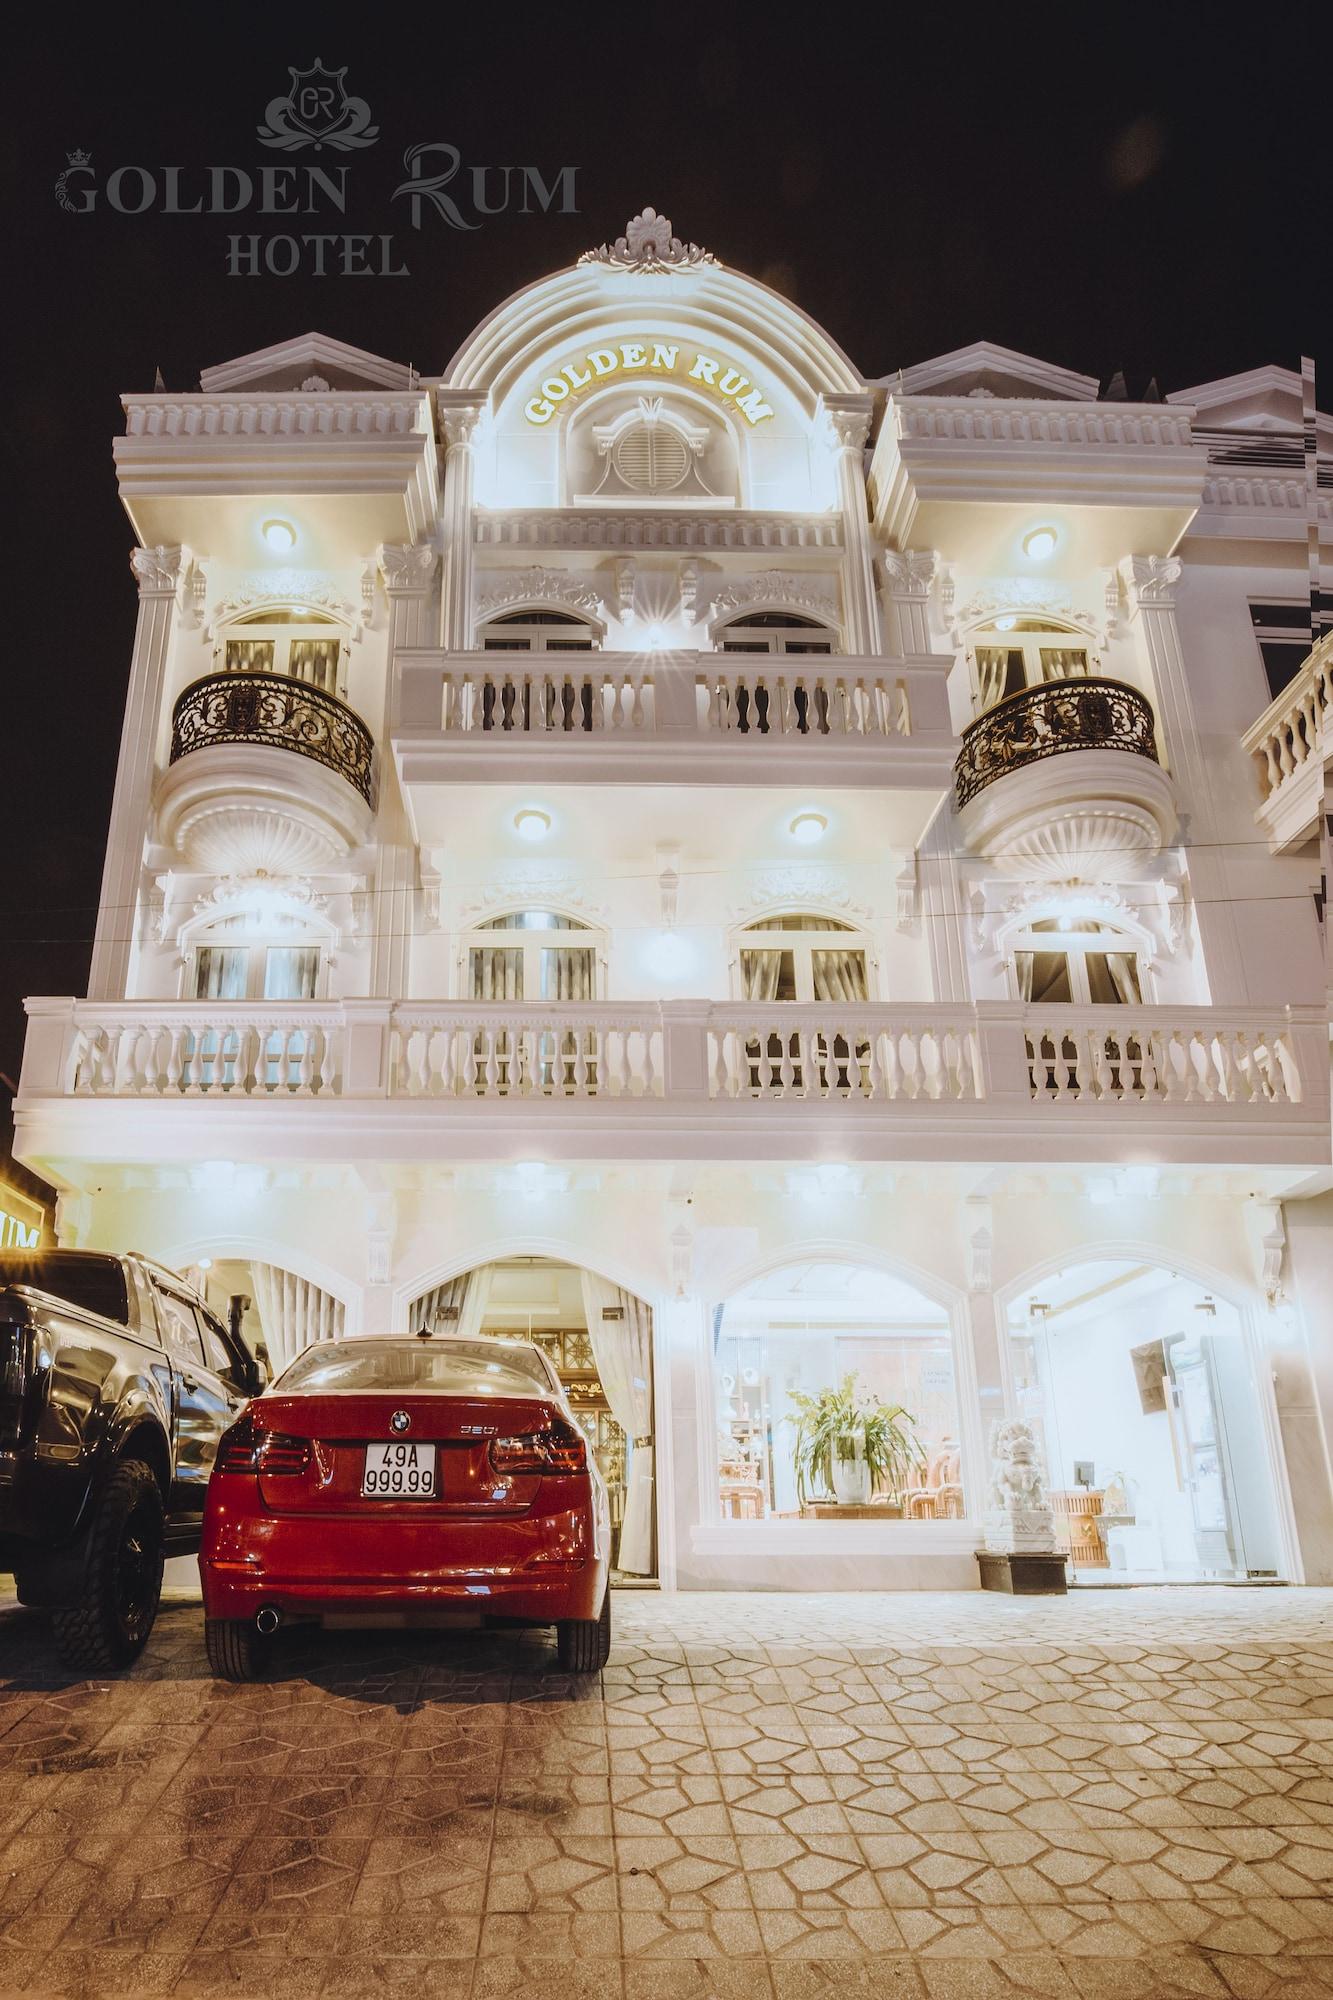 Golden Rum Hotel, Đà Lạt